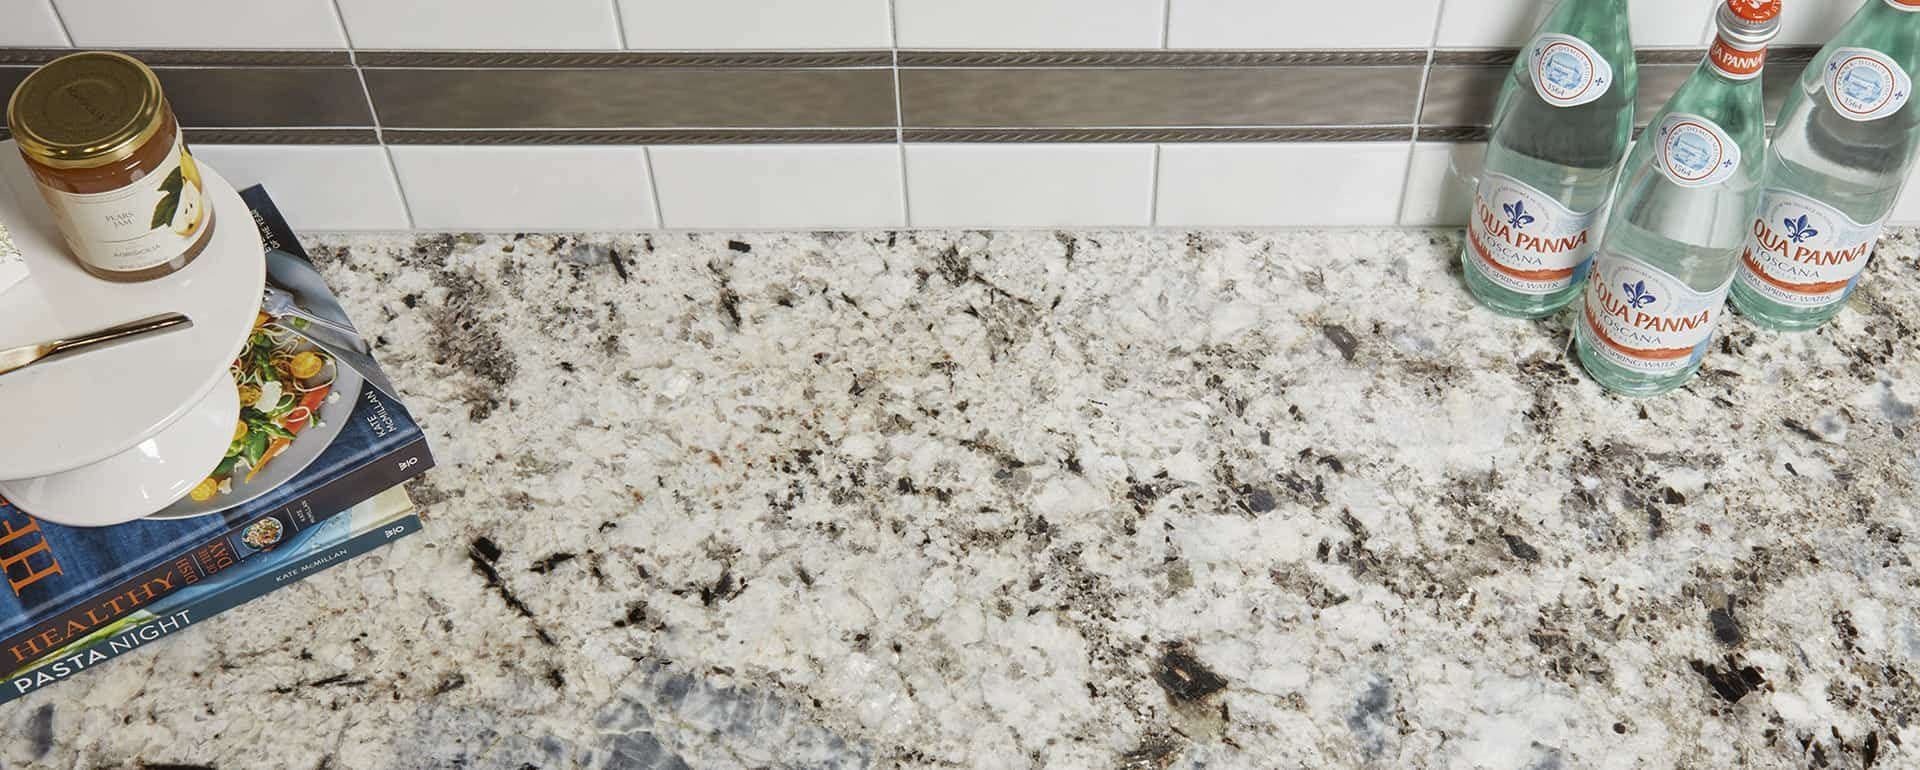 Blue Galaxy Natural Stone Granite Slab Arizona Tile Room Inspiration Countertops Inspiration